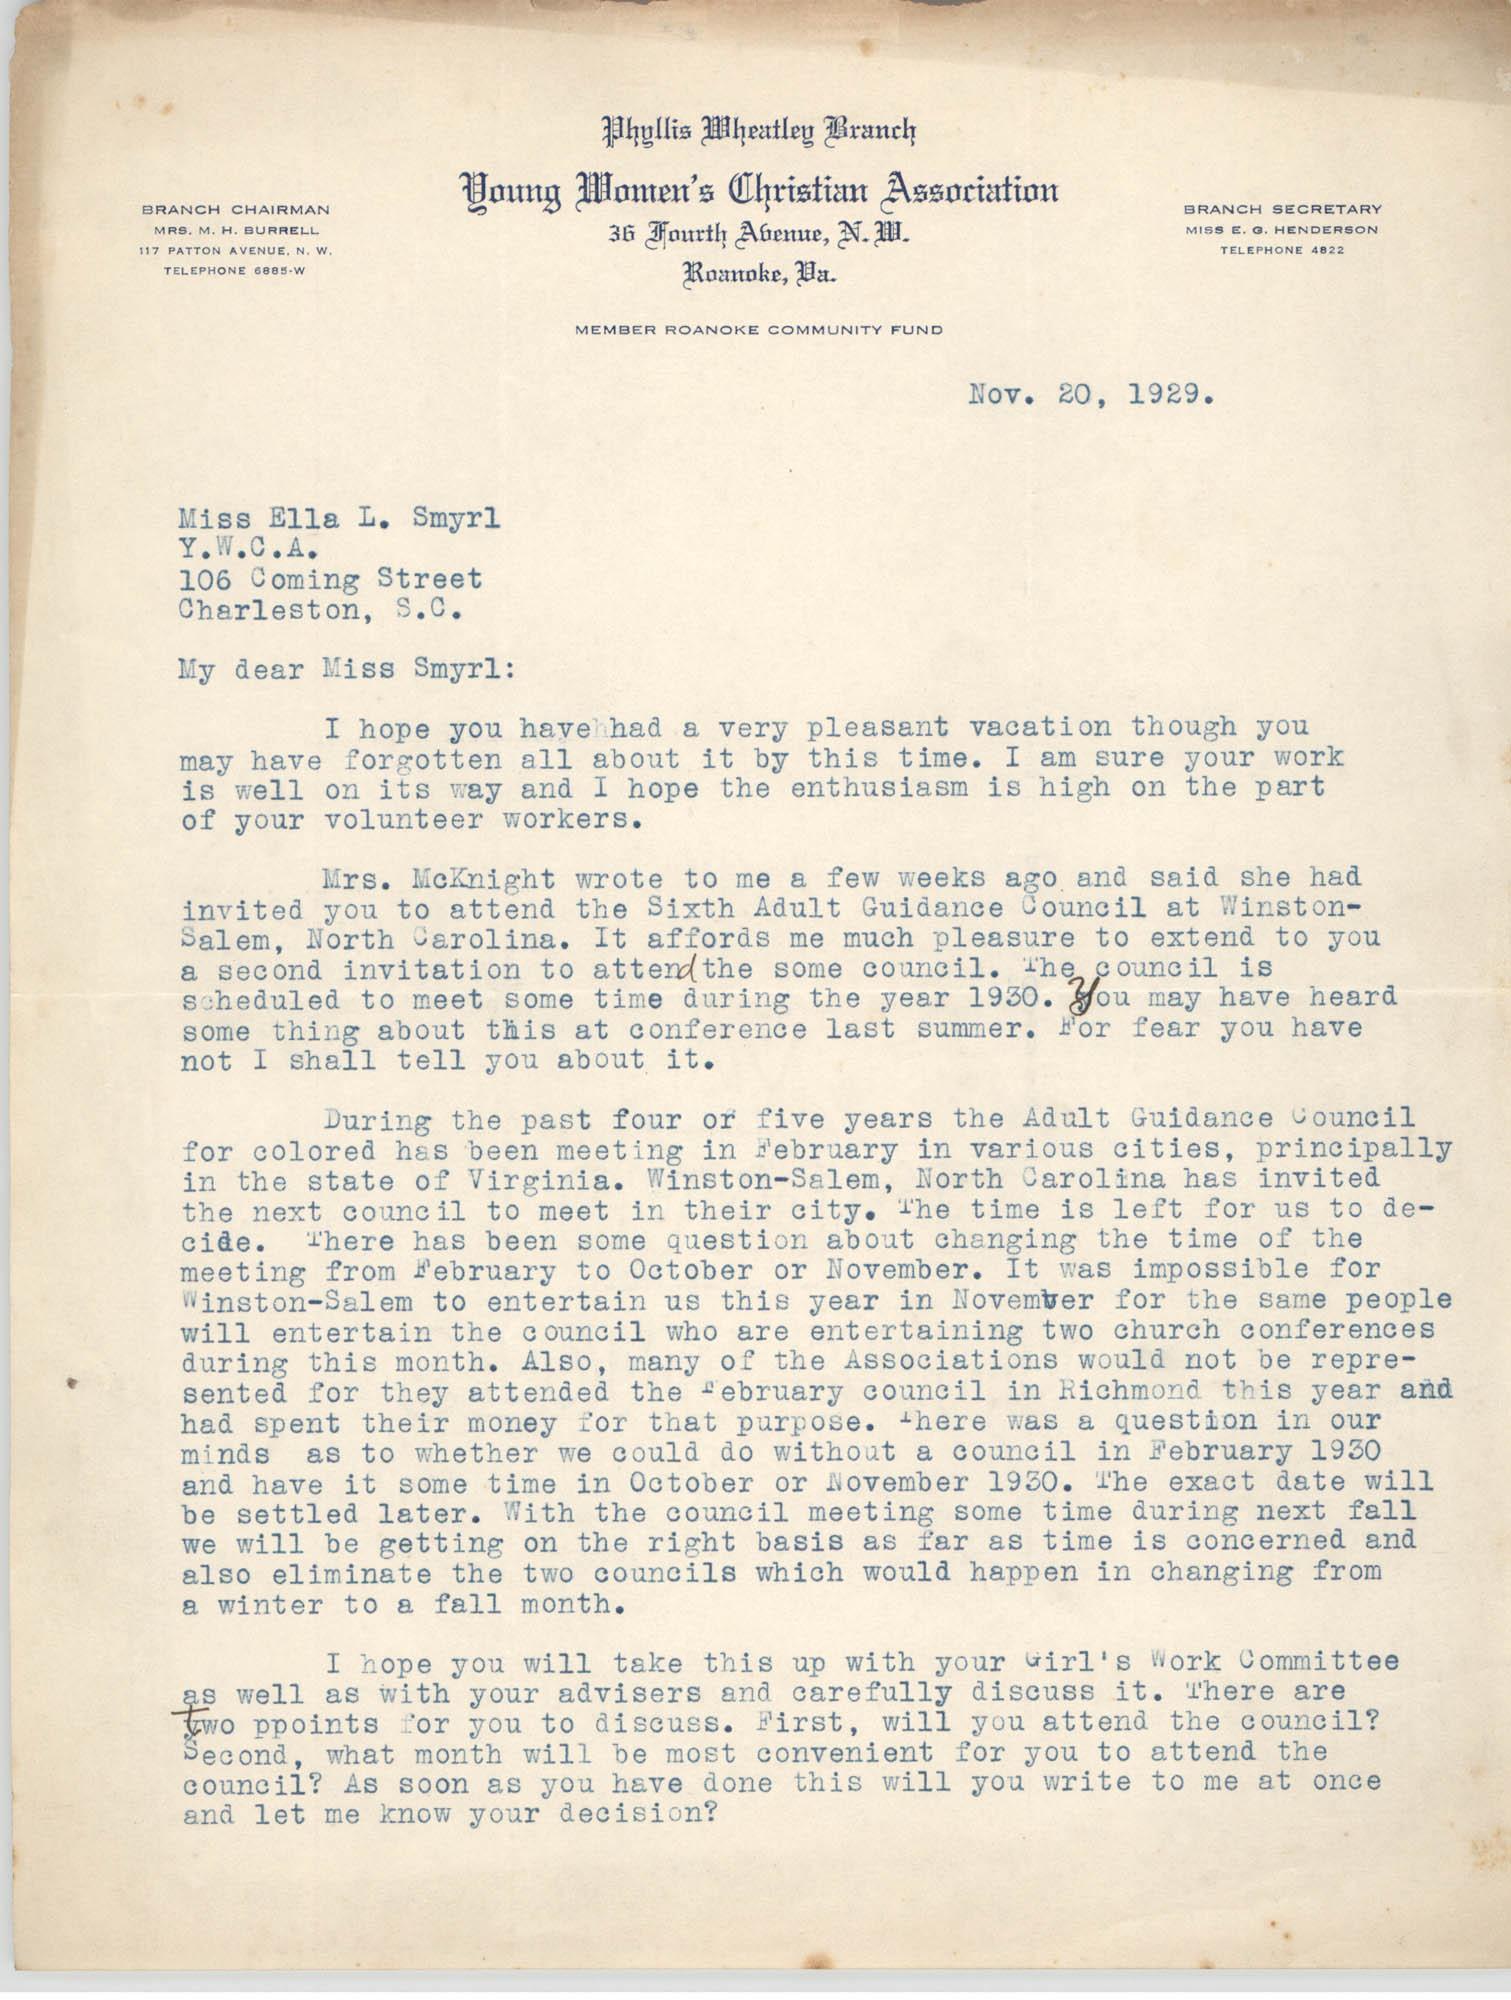 Letter from Y.W.C.A. to Ella L. Smyrl, November 20, 1929